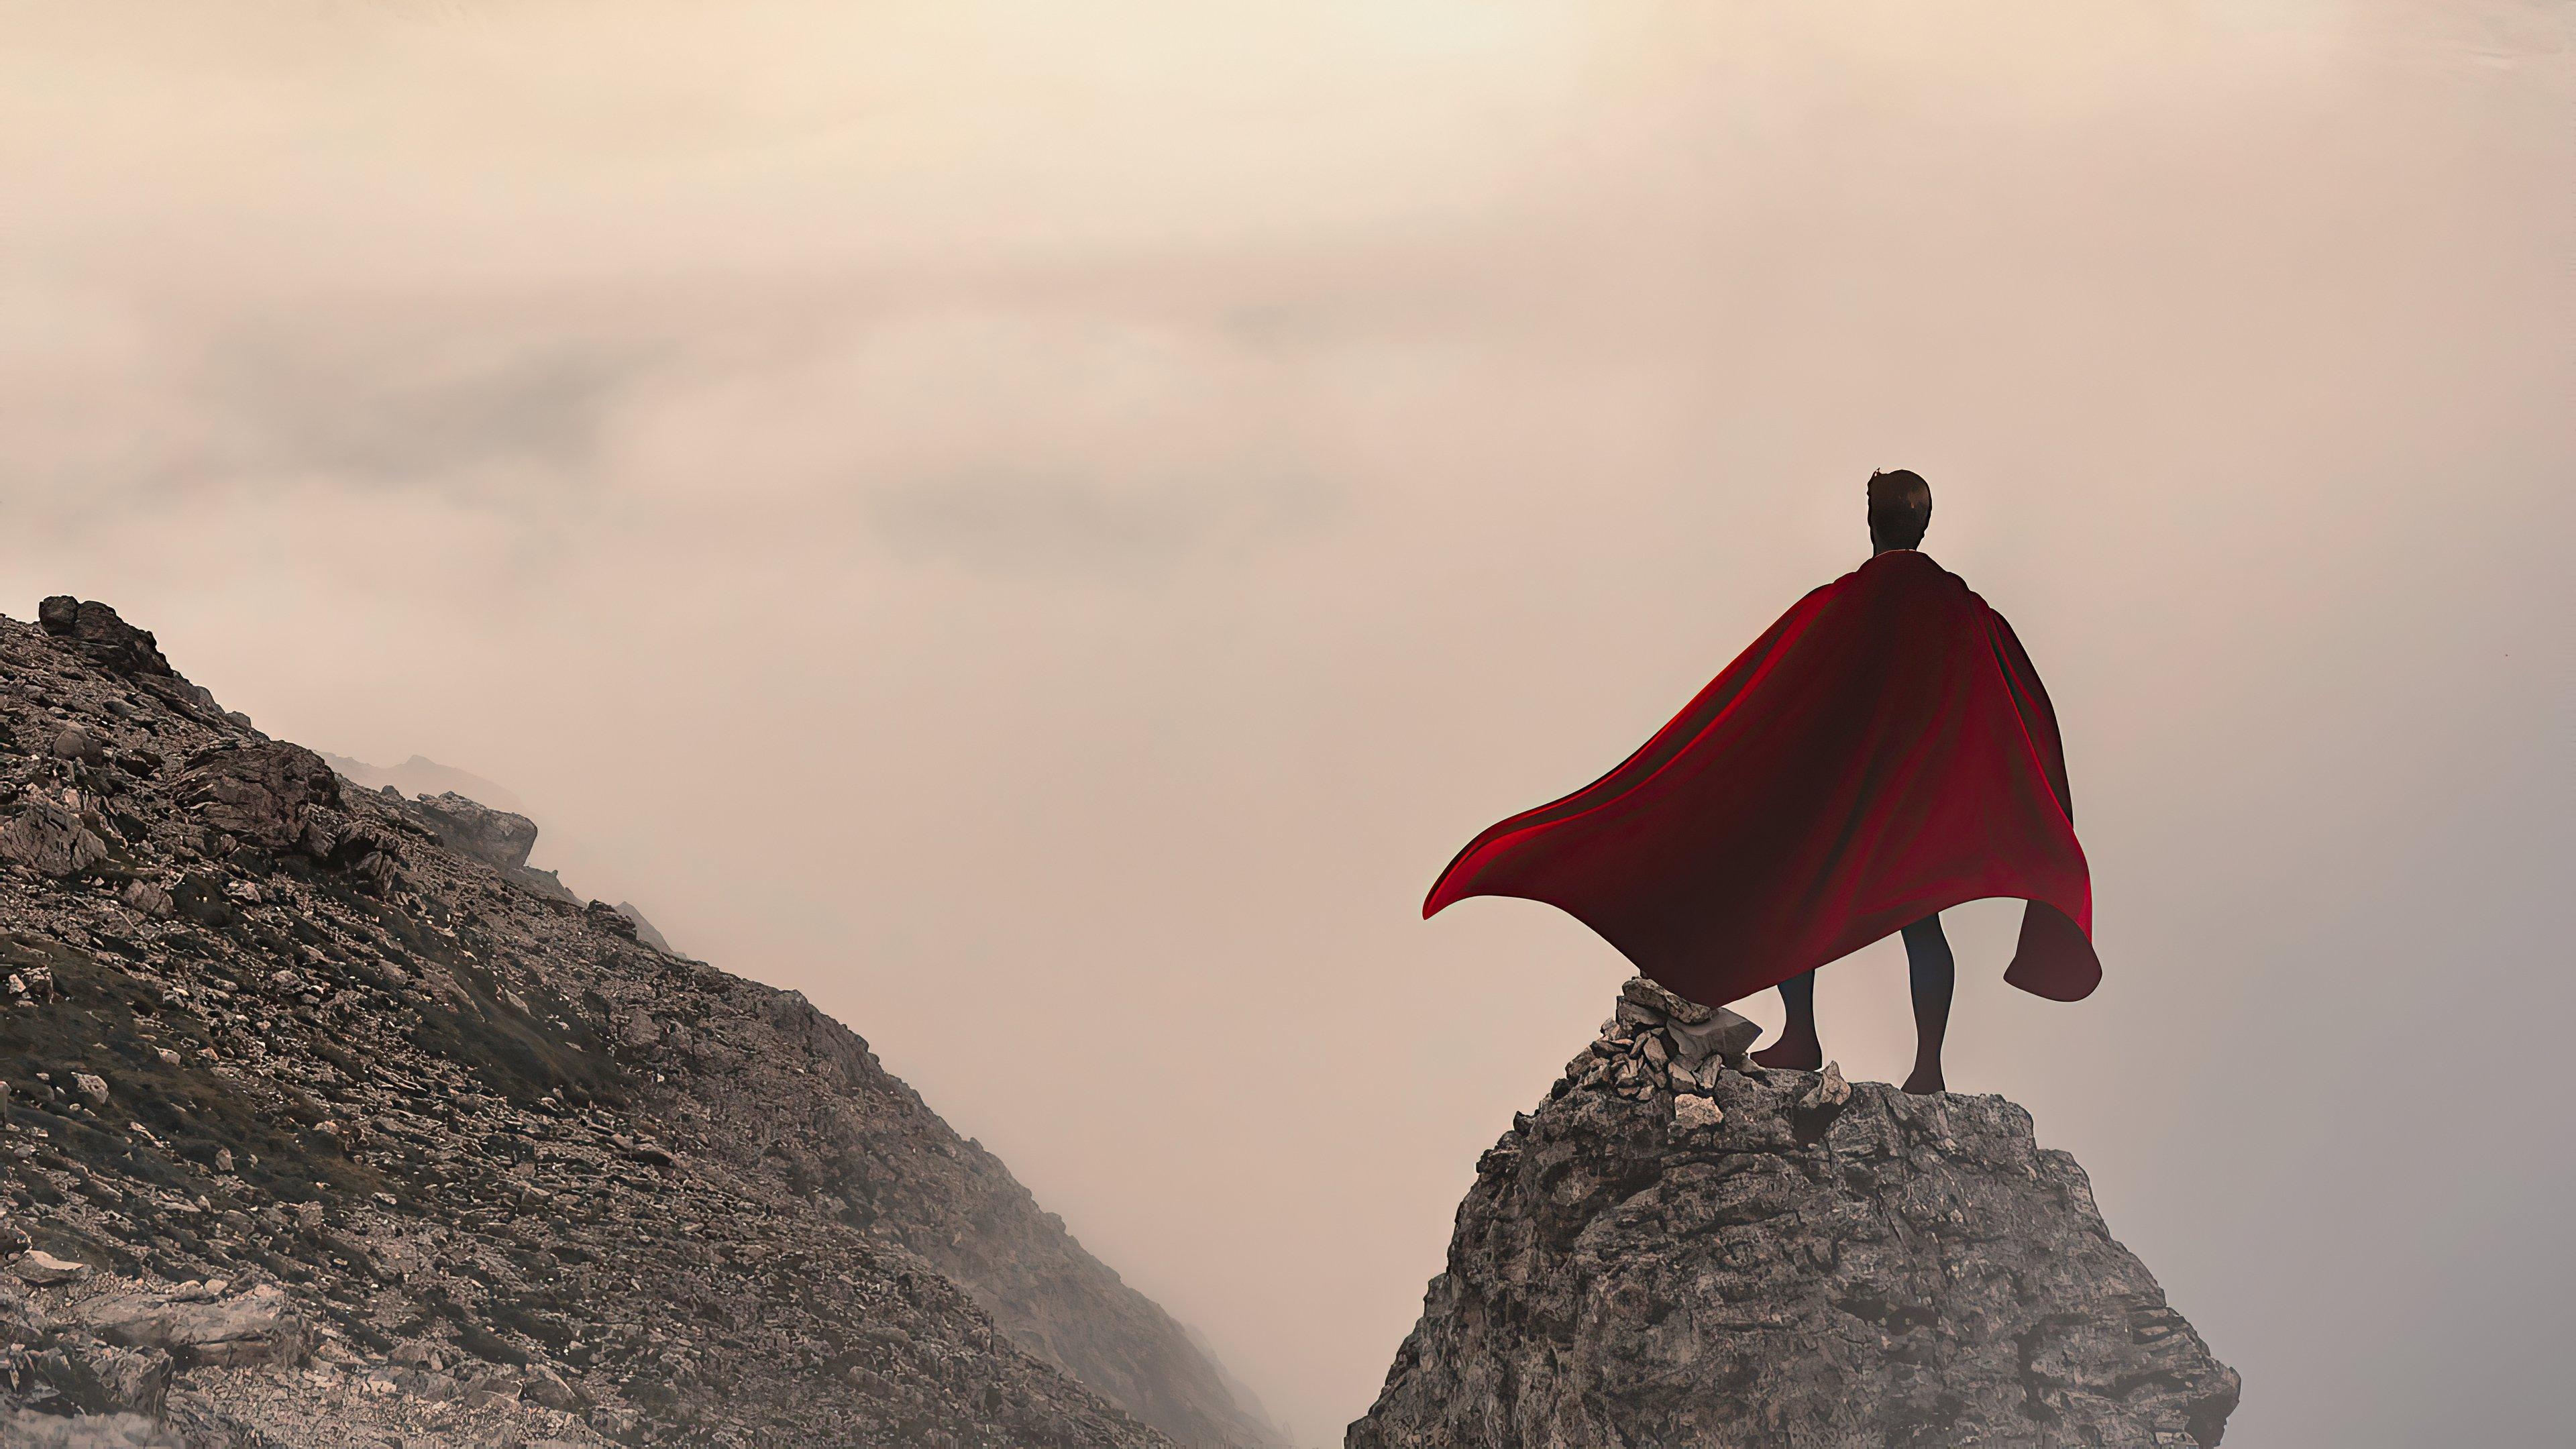 Wallpaper Superman over mountain infront of mist